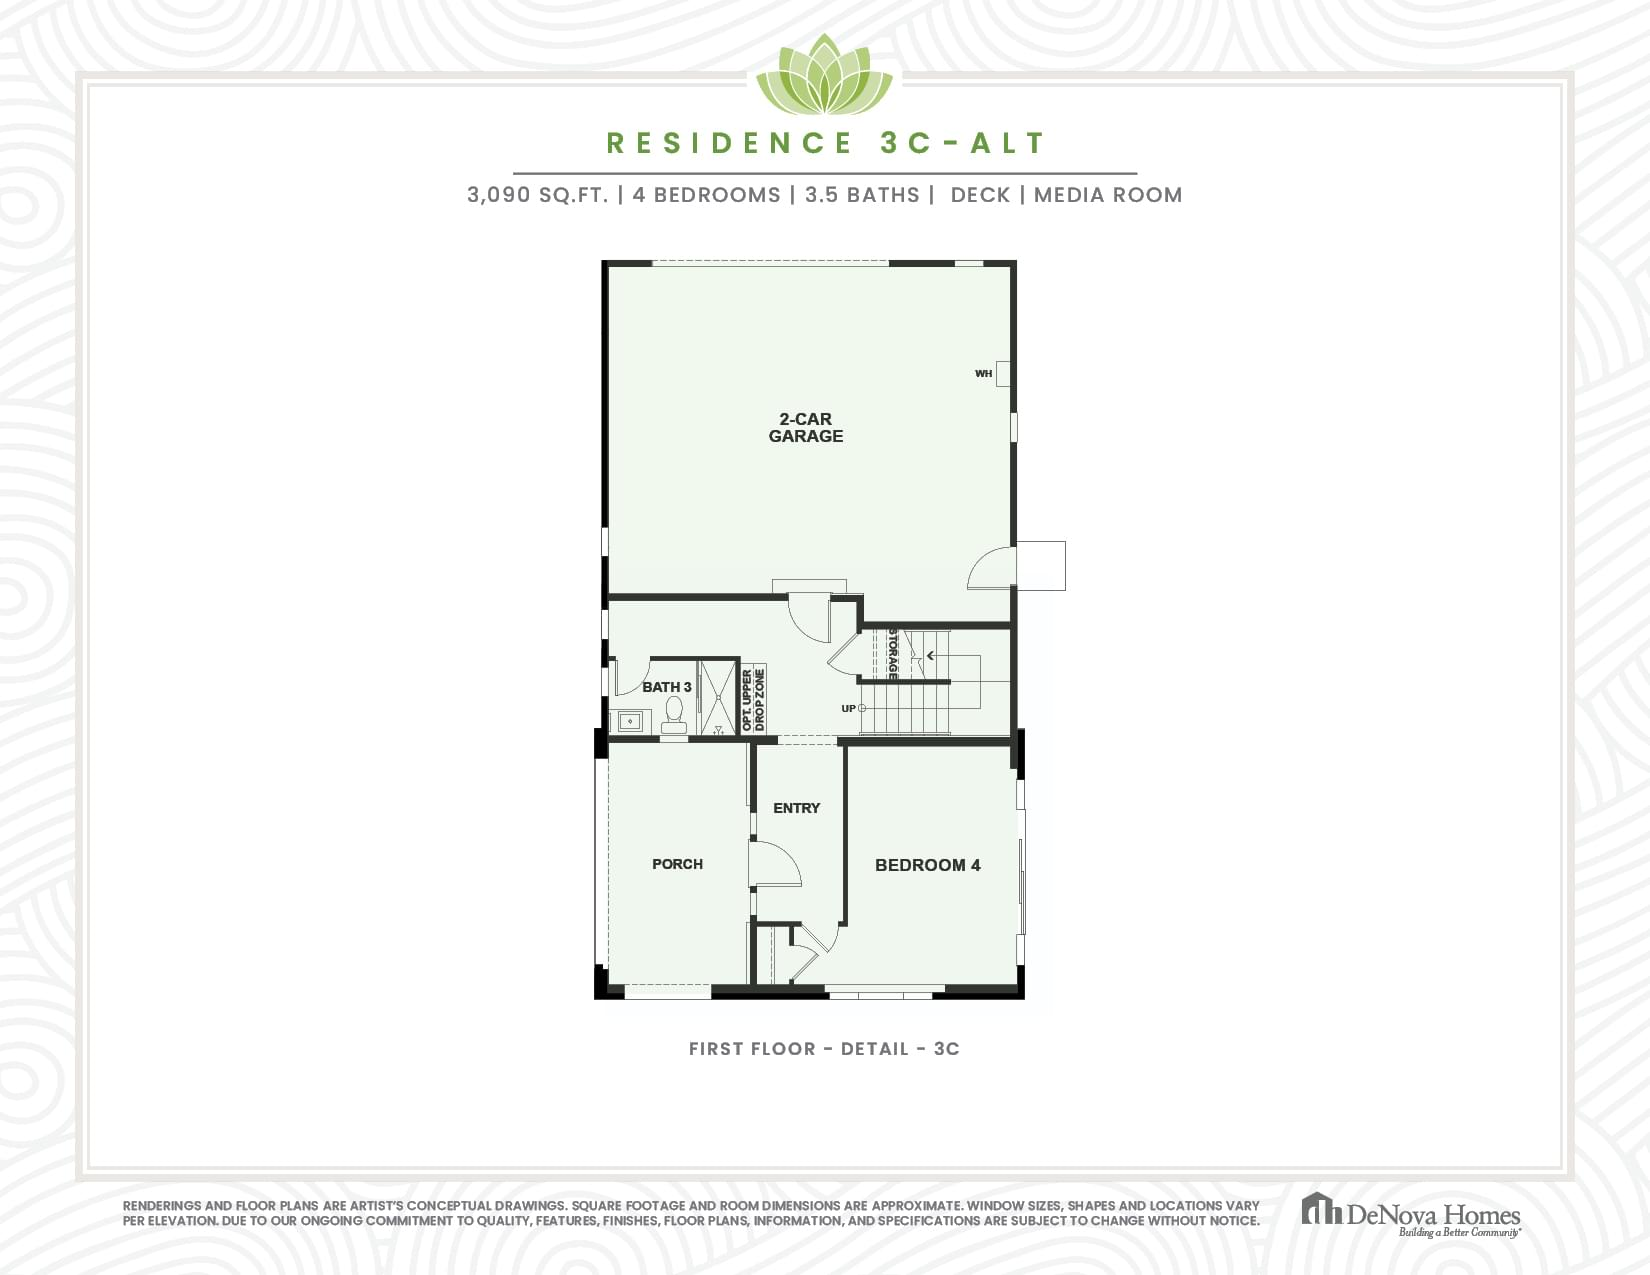 Residence 3 Alt. San Jose, CA New Home